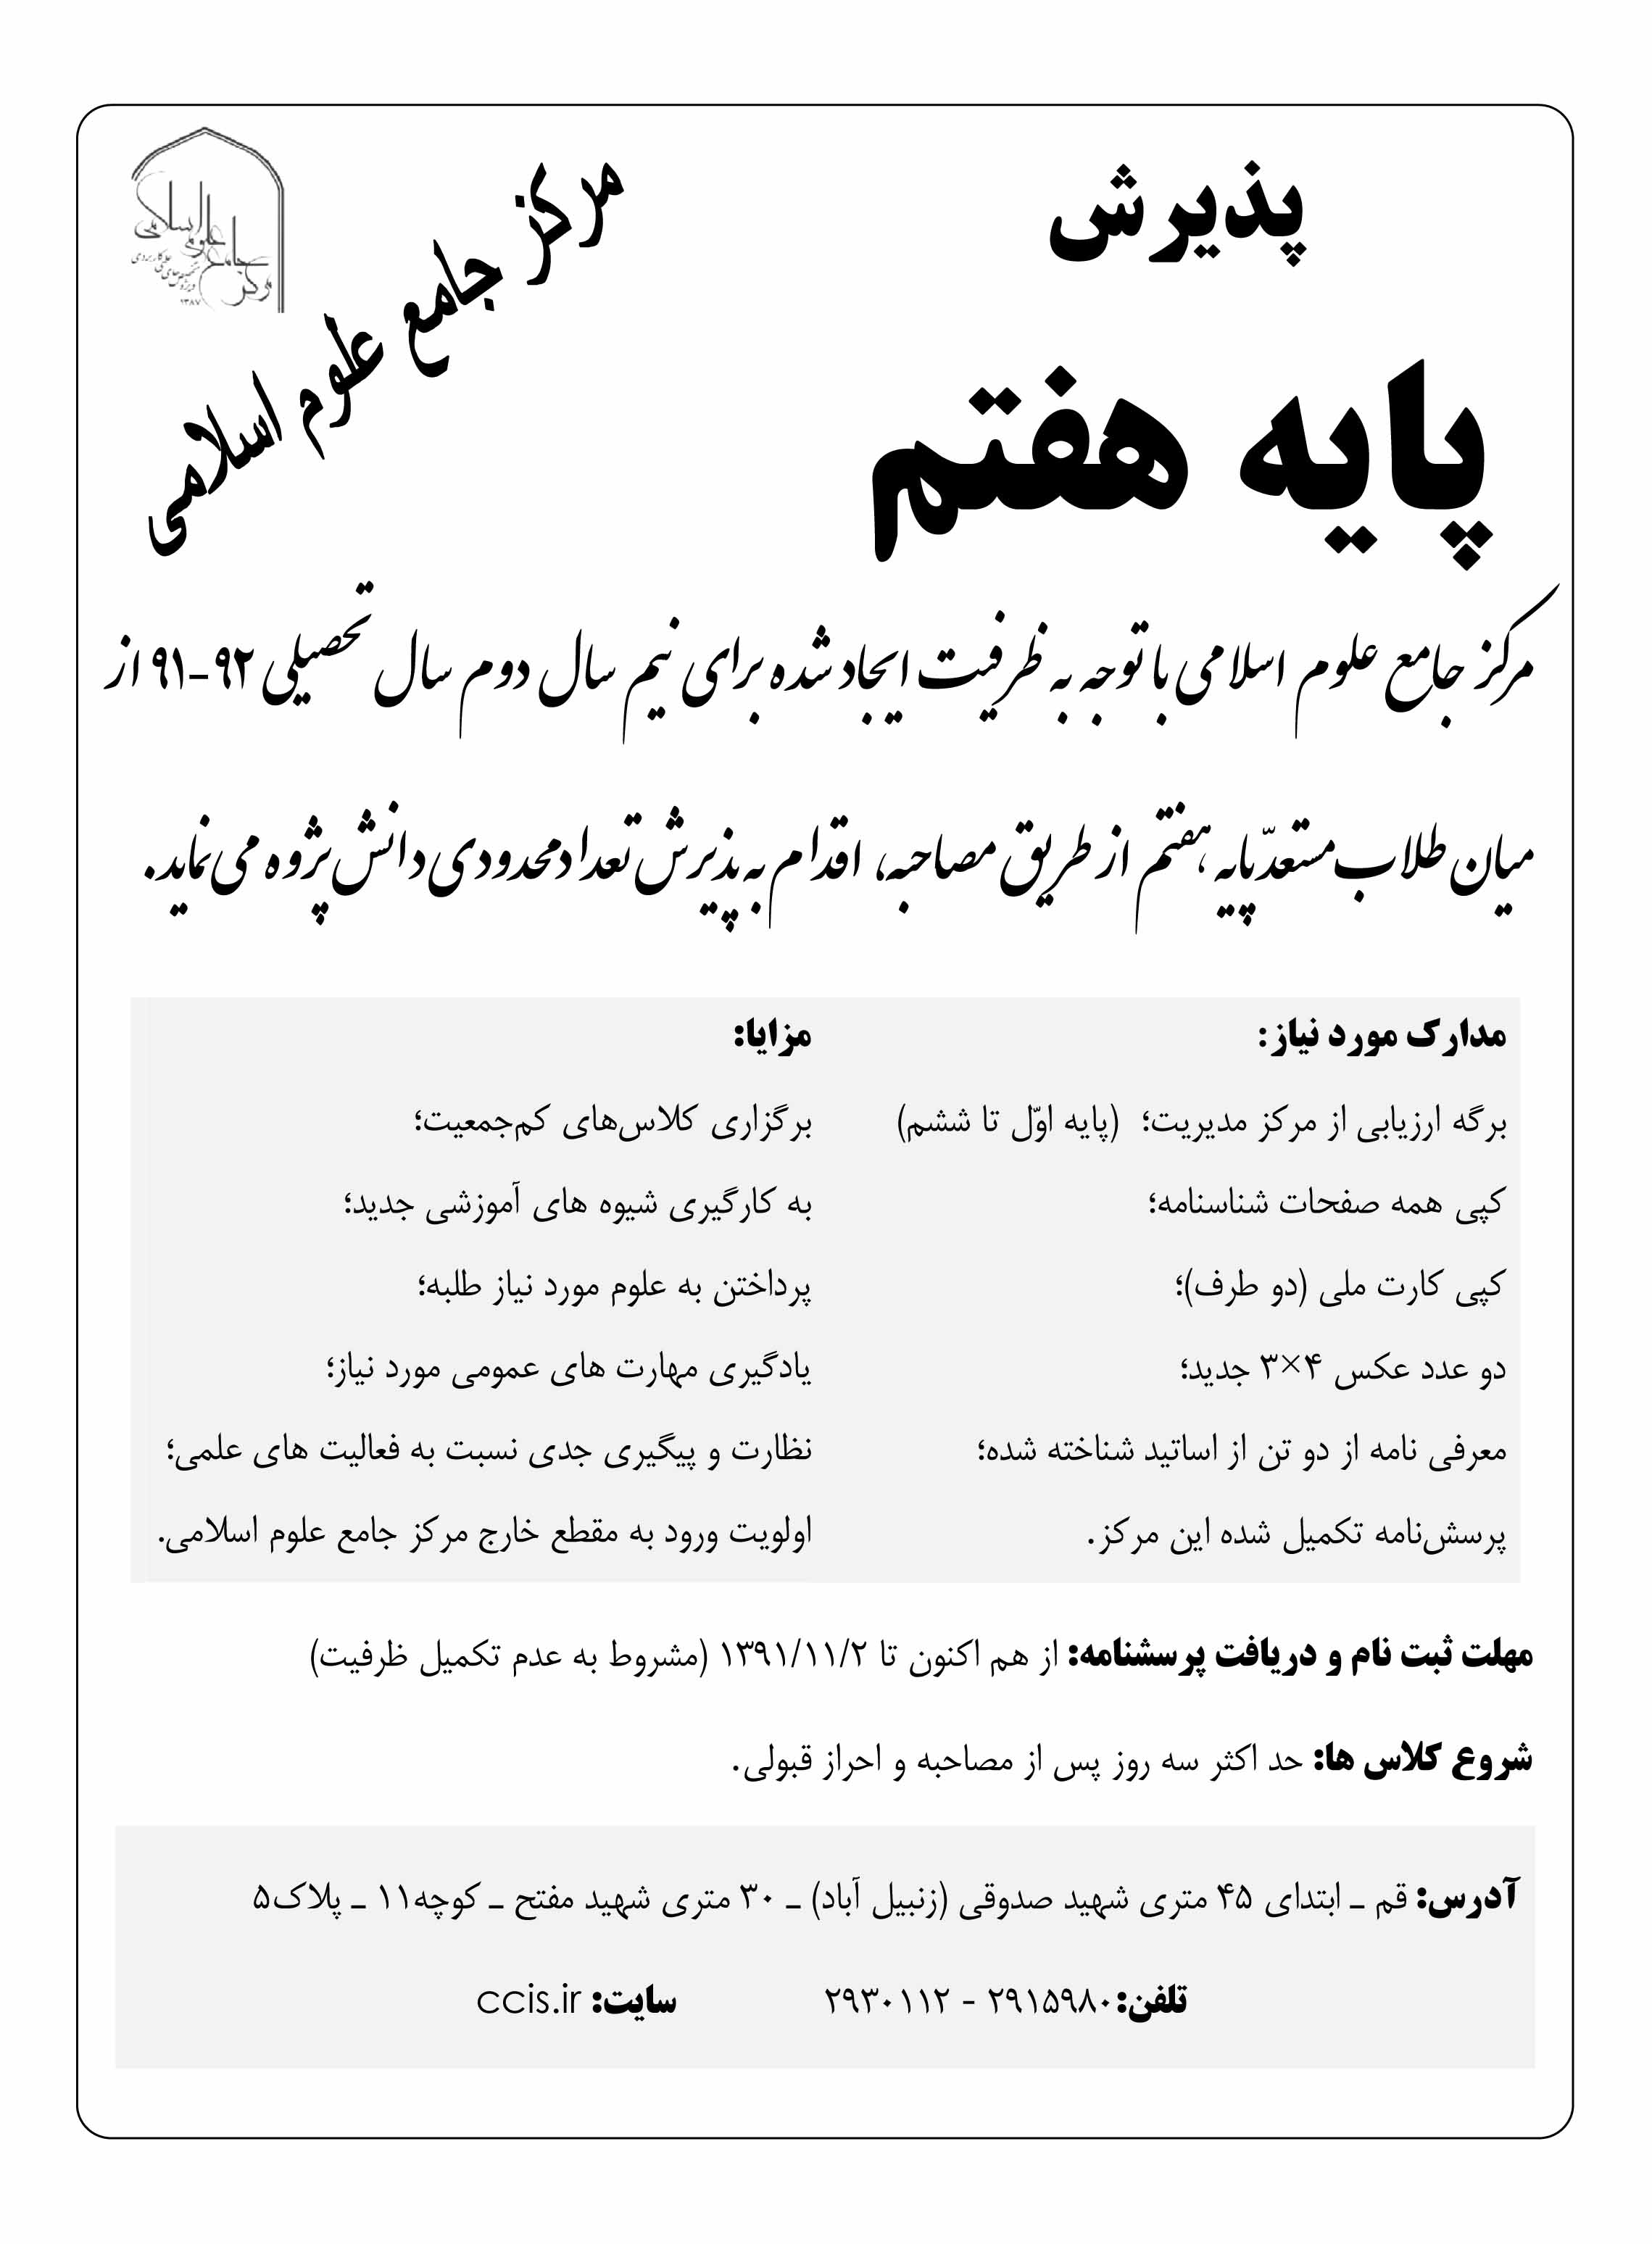 مرکز جامع علوم اسلامی